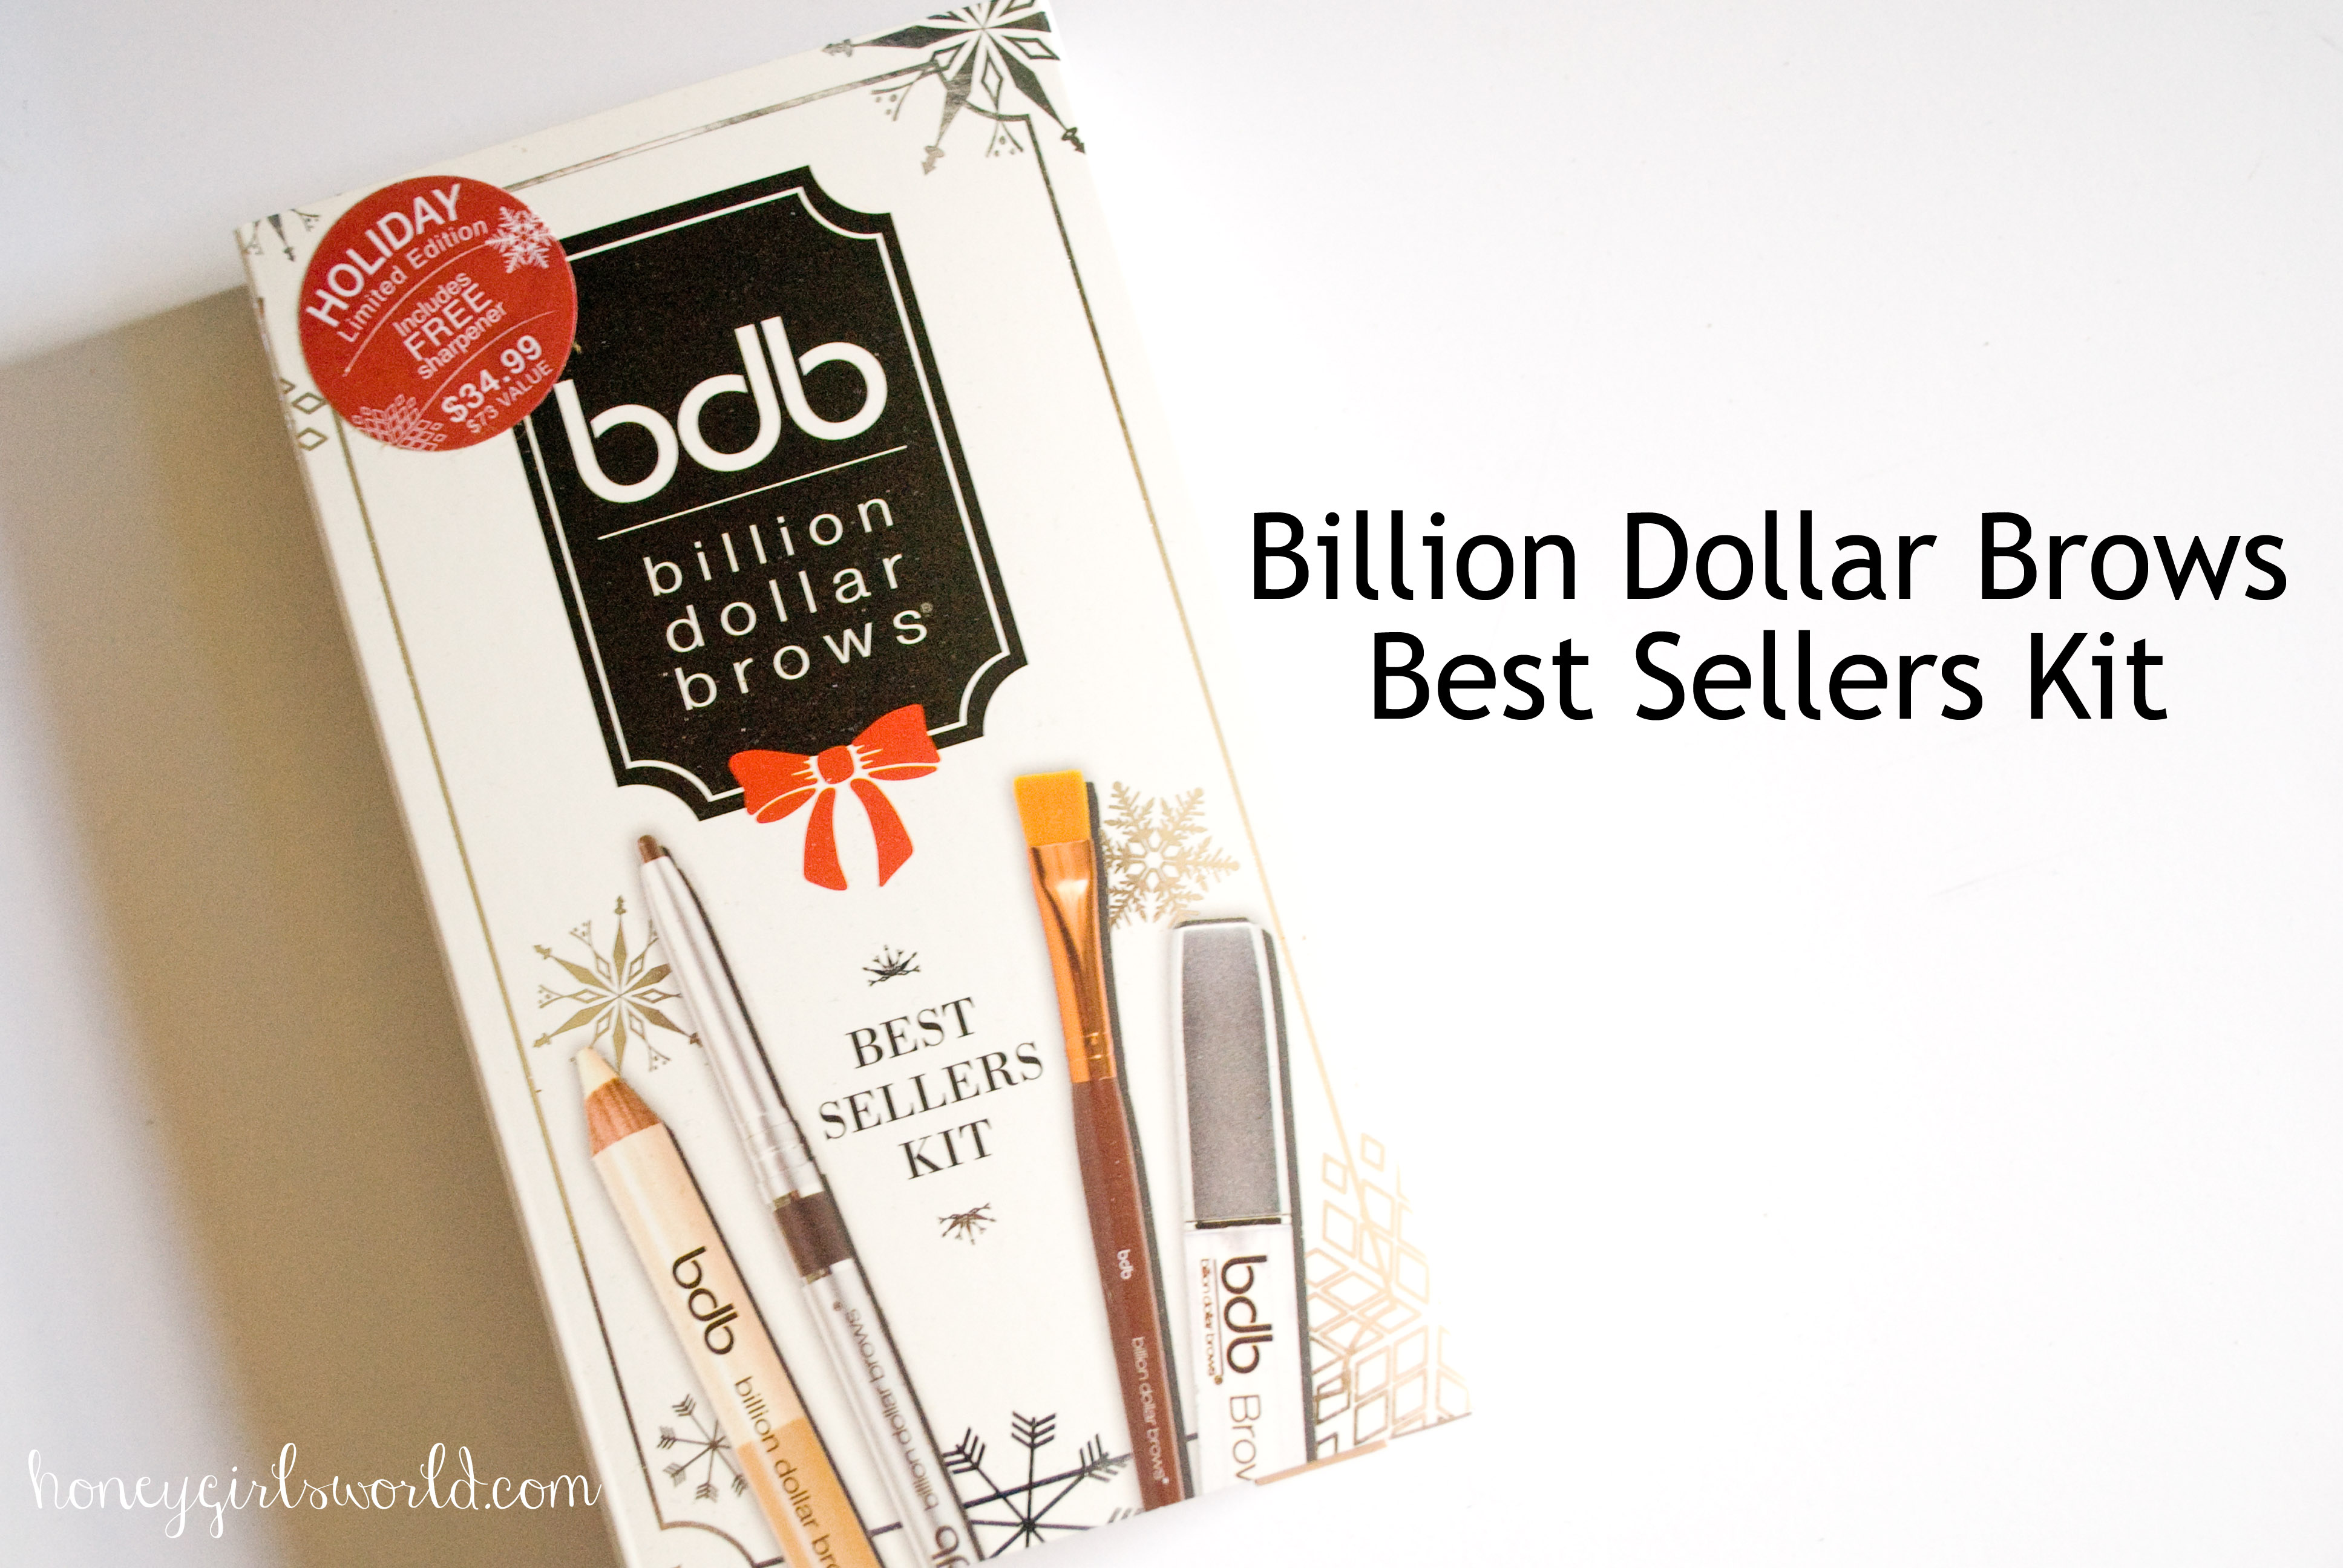 Billion Dollar Brows Best Sellers Kit